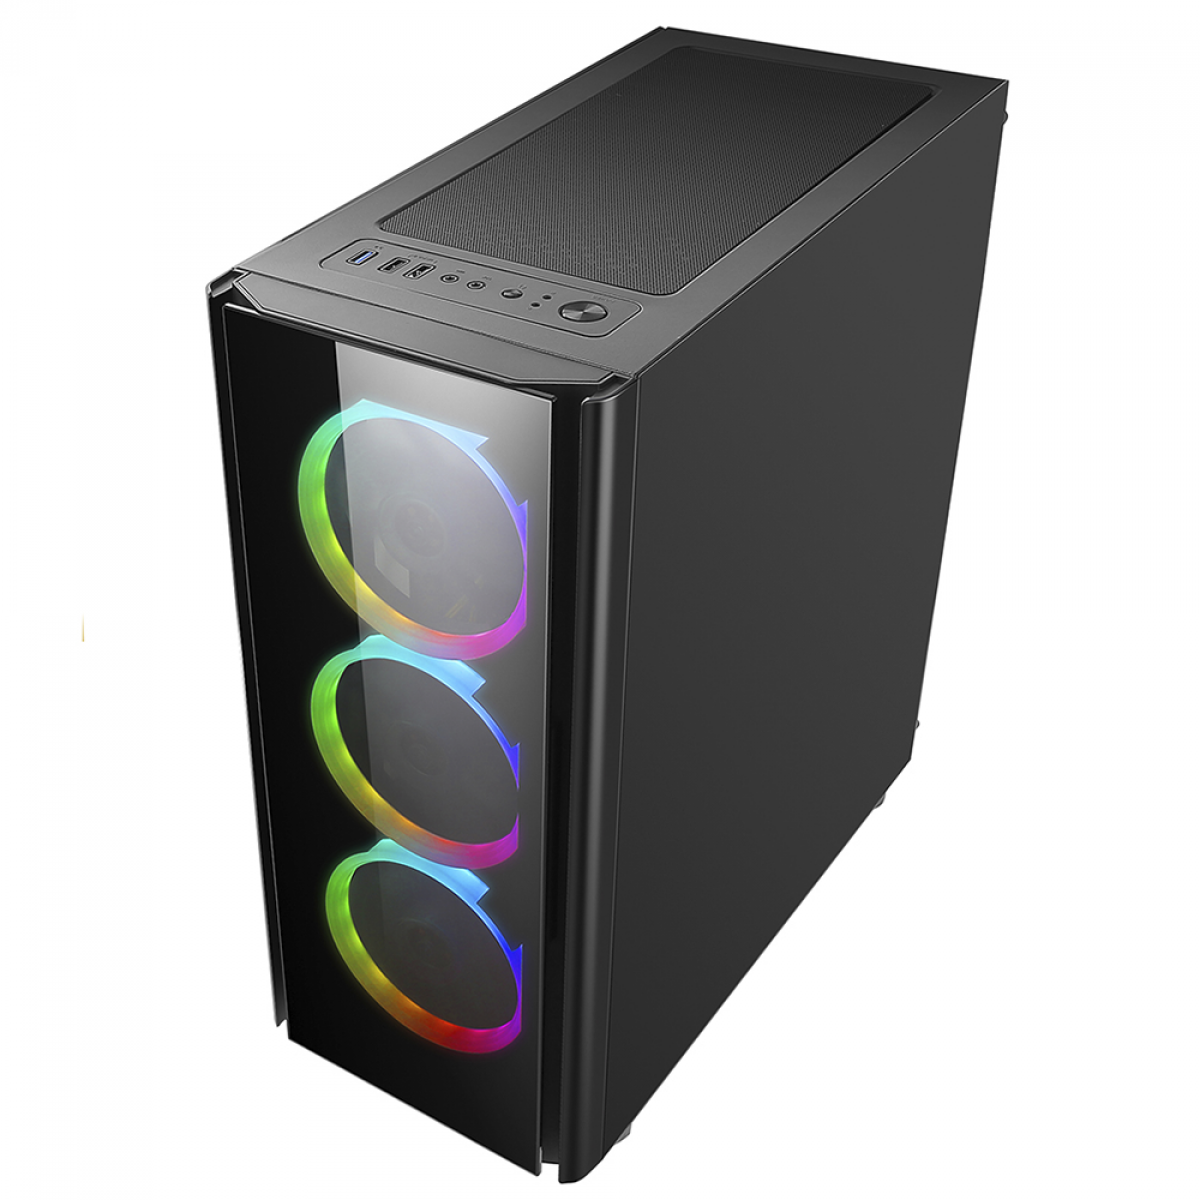 Gabinete Gamer Liketec Streamer V2, Mid Tower, RGB, Vidro Temperado, Black, ATX, Sem Fonte, Com 3 Fans